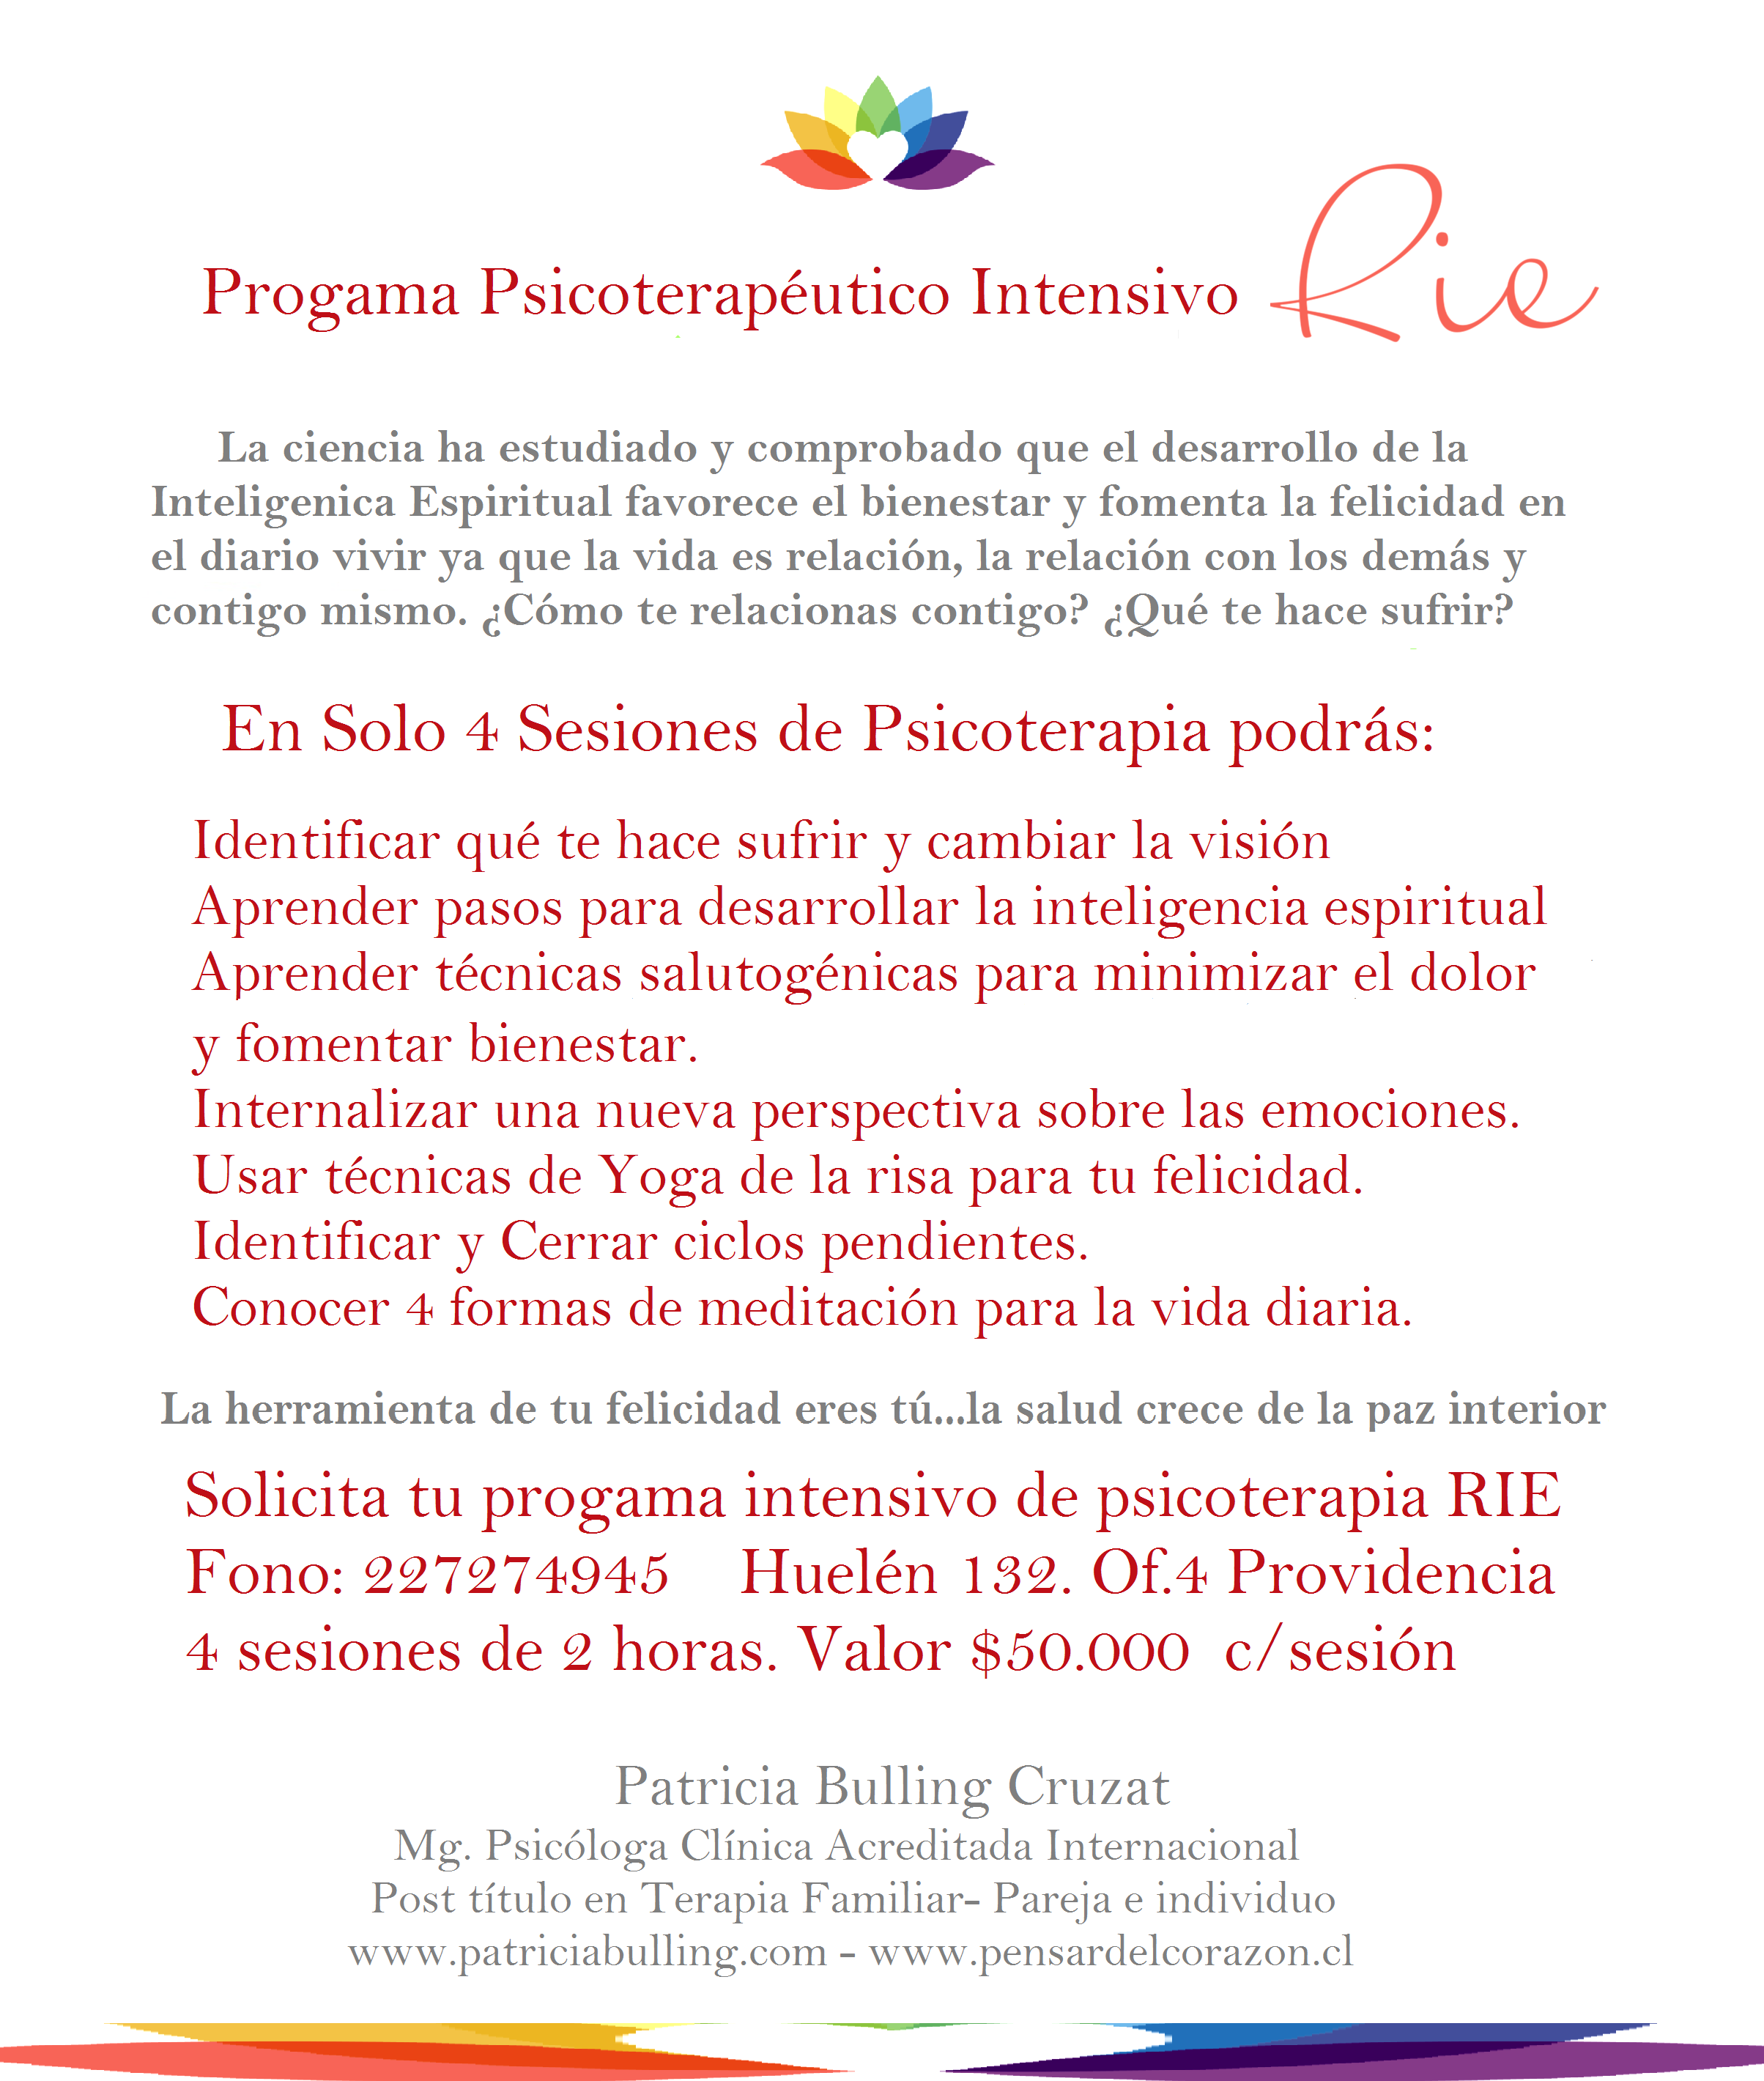 PROGRAMA PSICOTERAPIA RIE